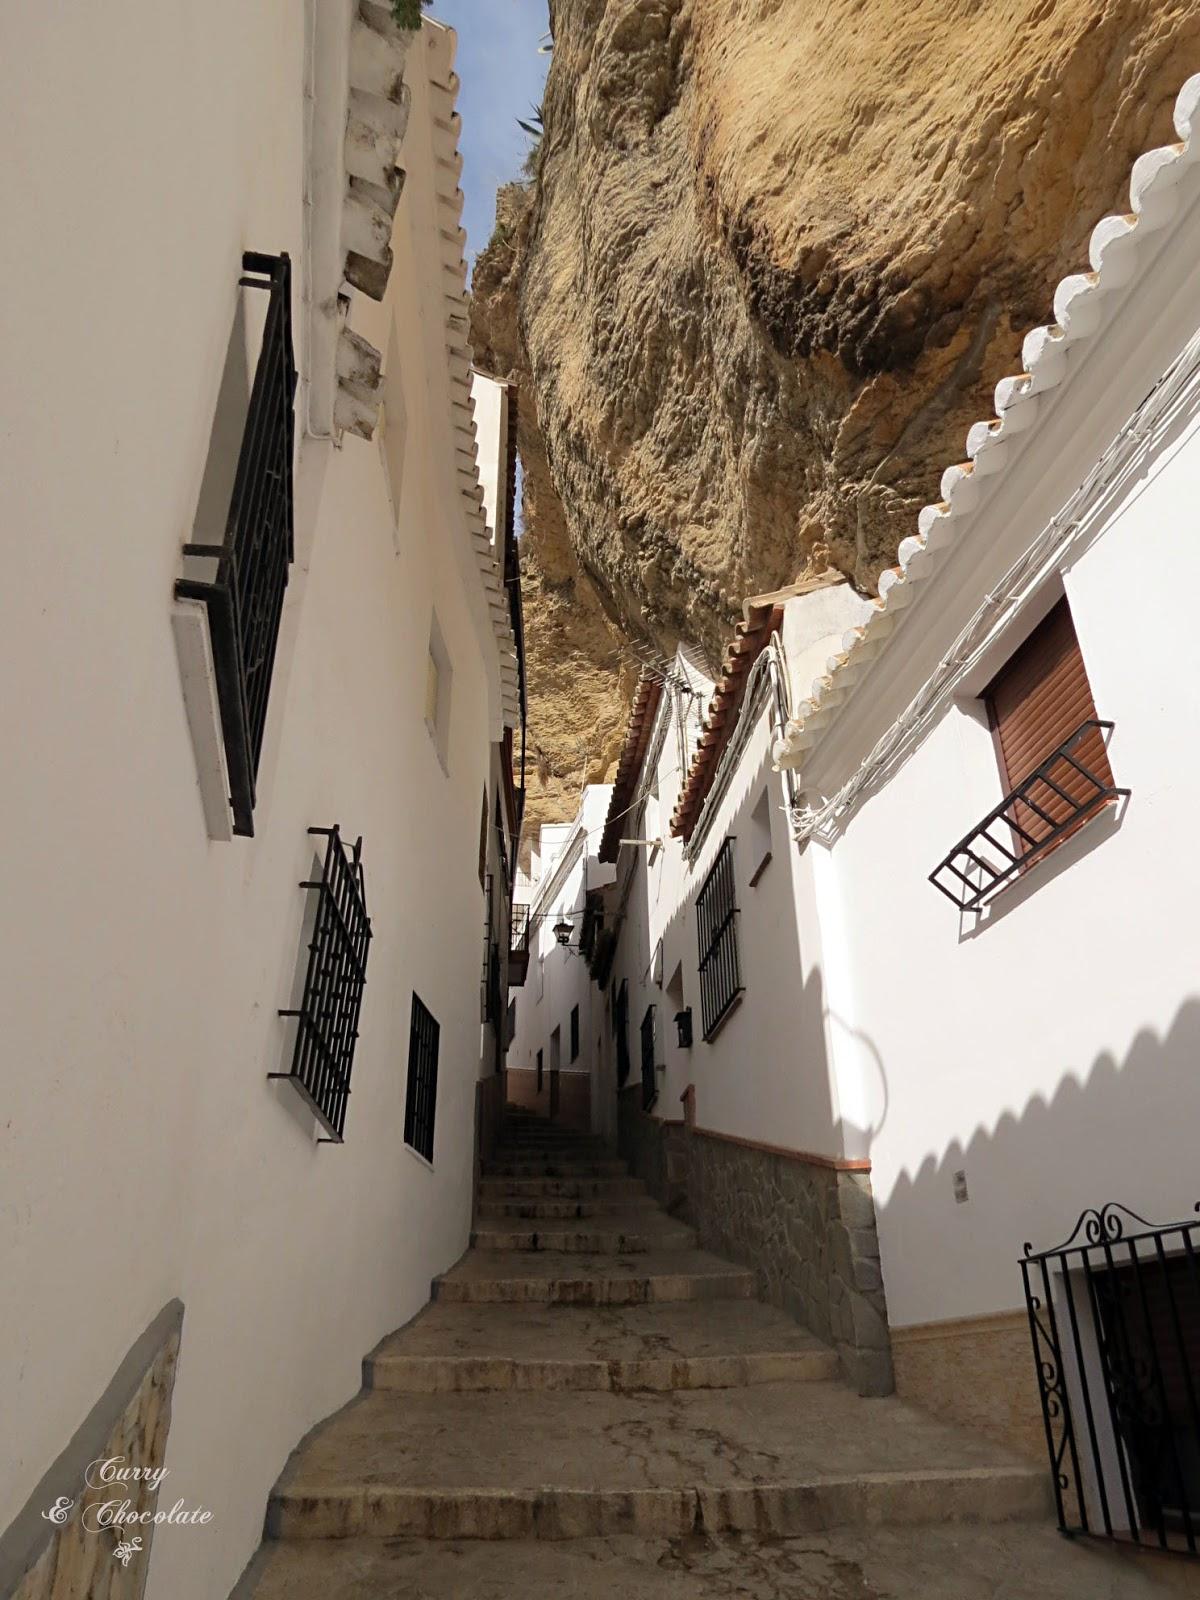 Calle Herrería - Setenil de las Bodegas